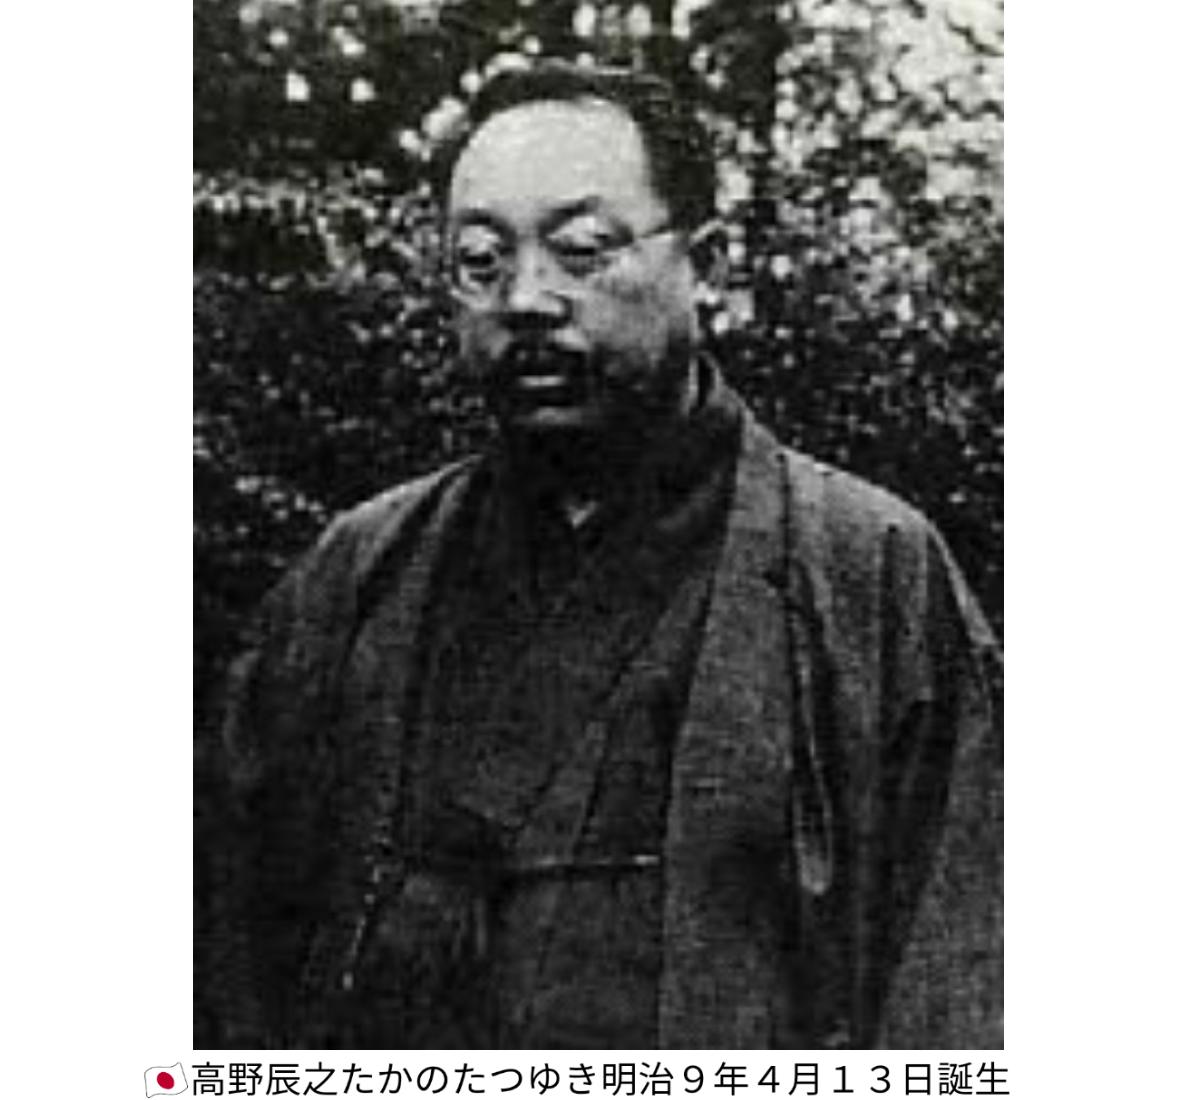 f:id:japanfather:20210419051157p:plain